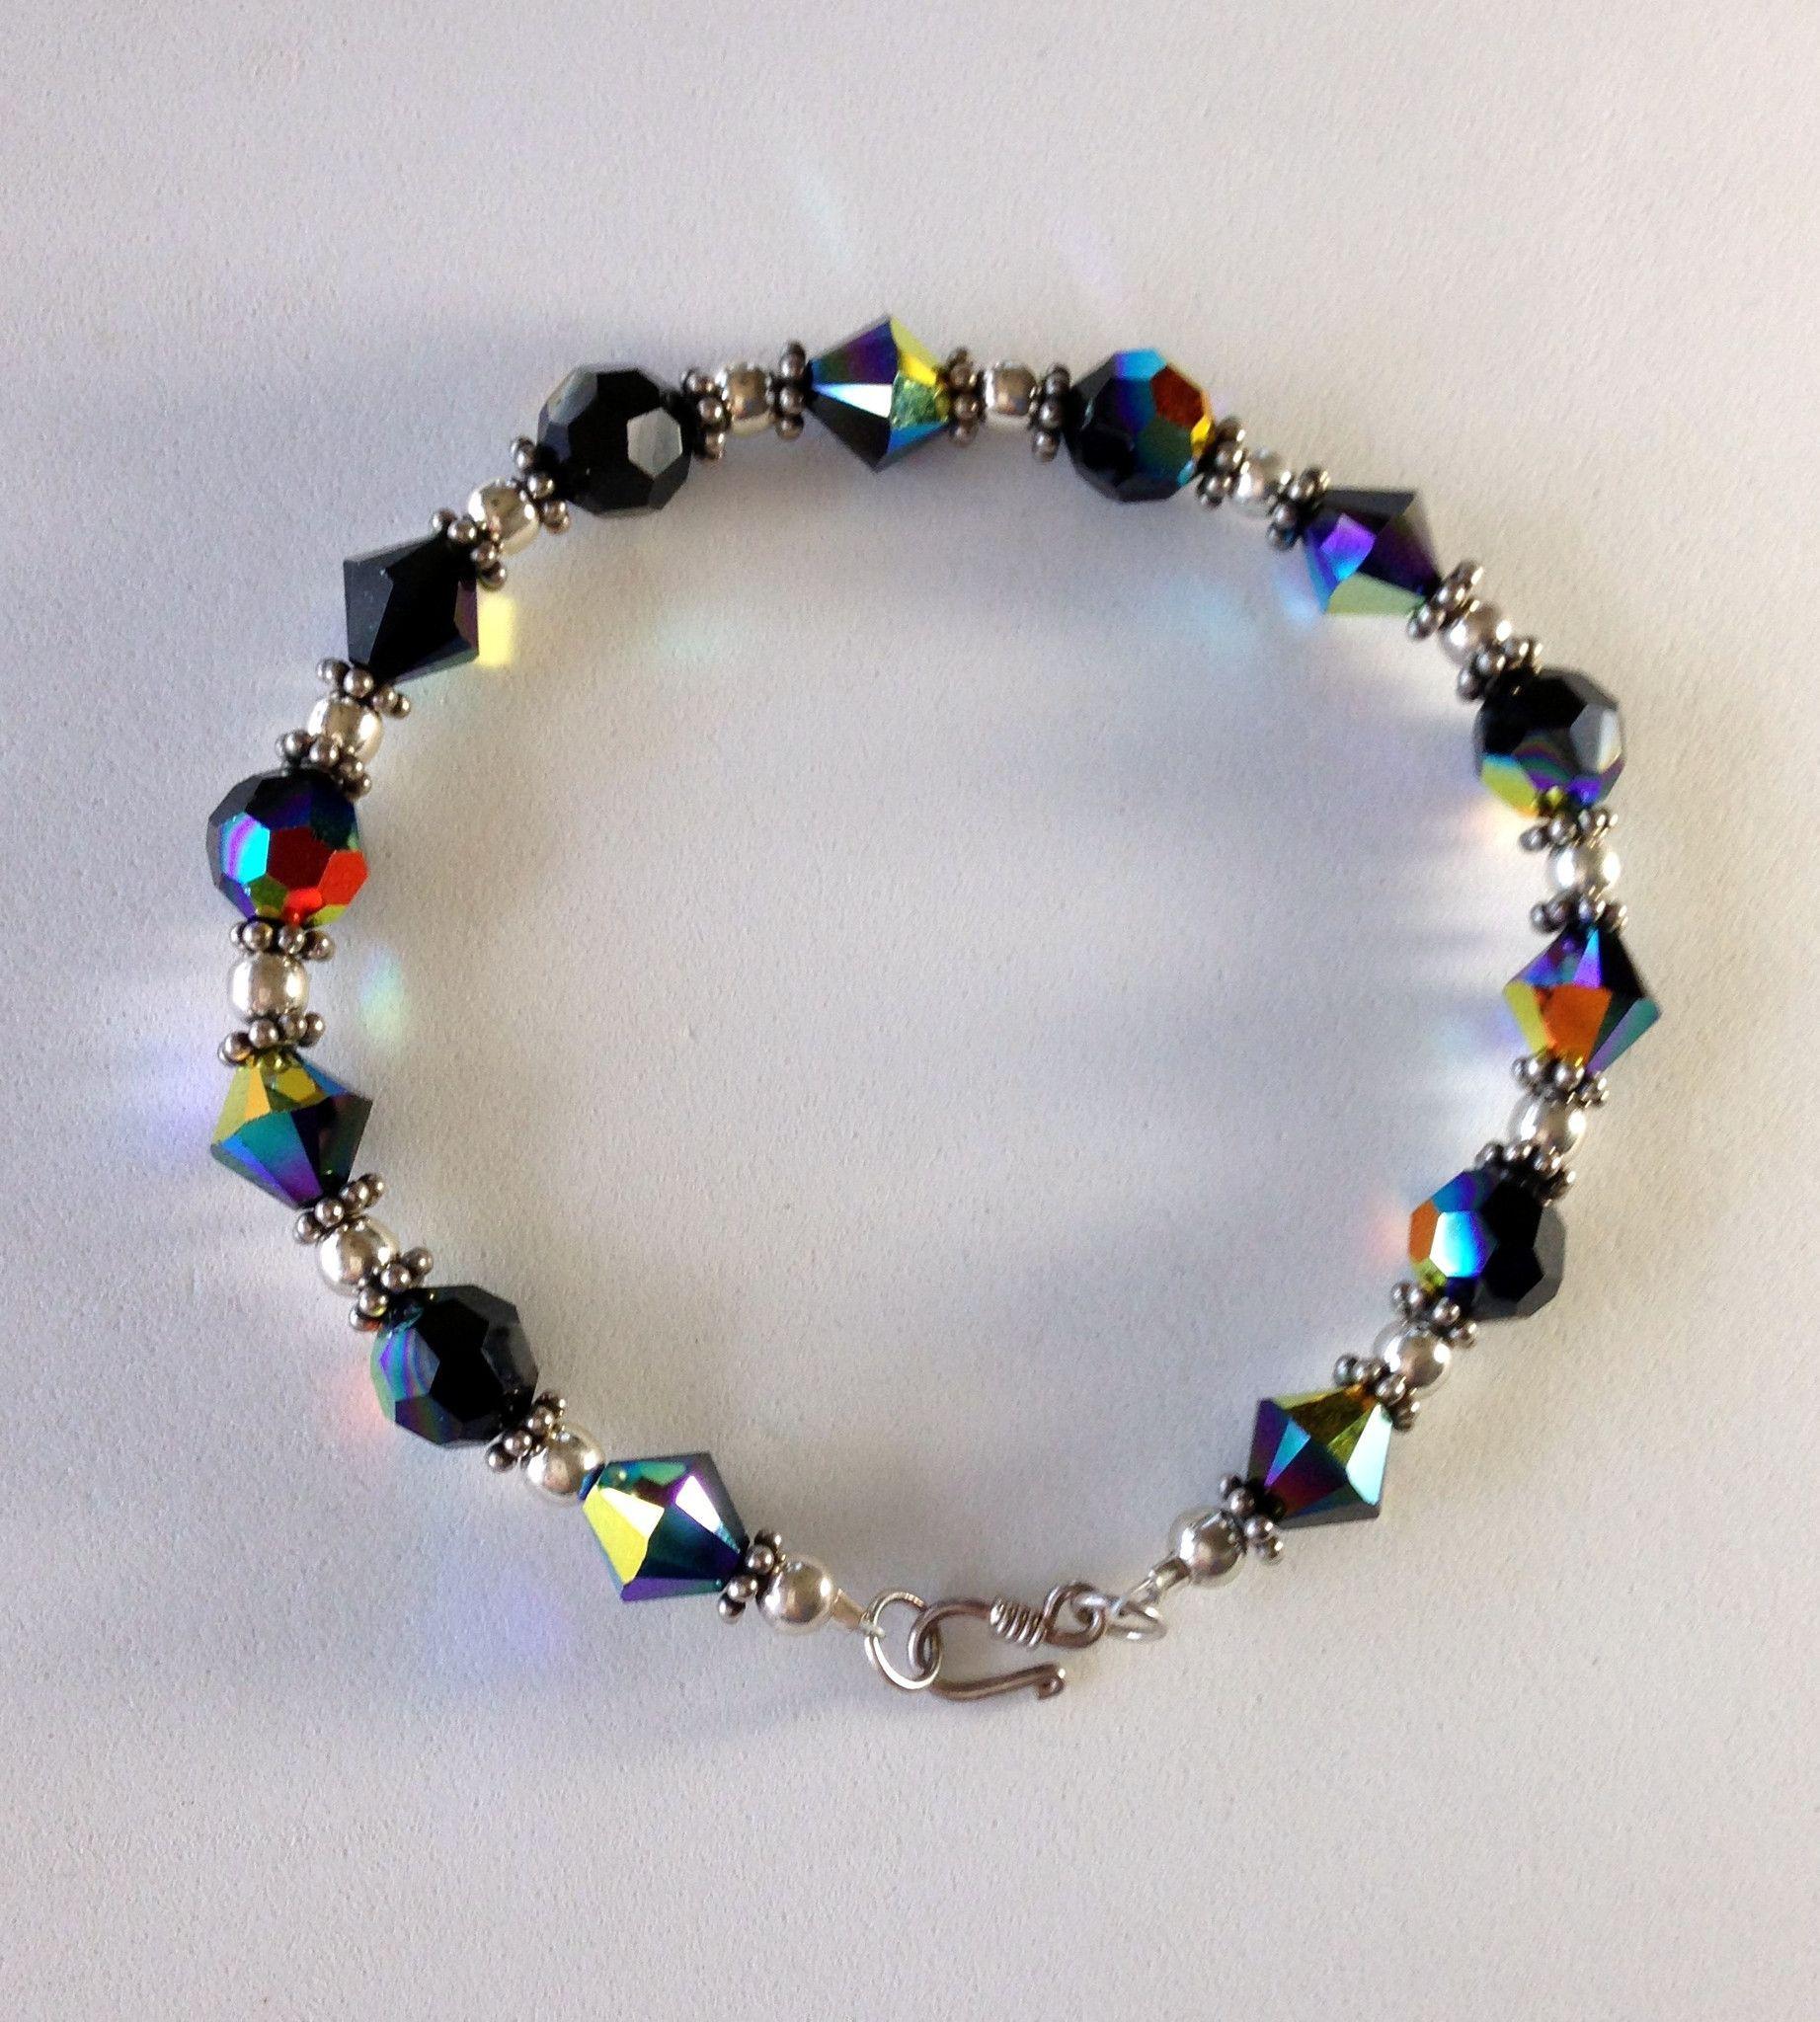 3cee76e3f71c Bracelet - Swarovski Crystals - Sterling Silver